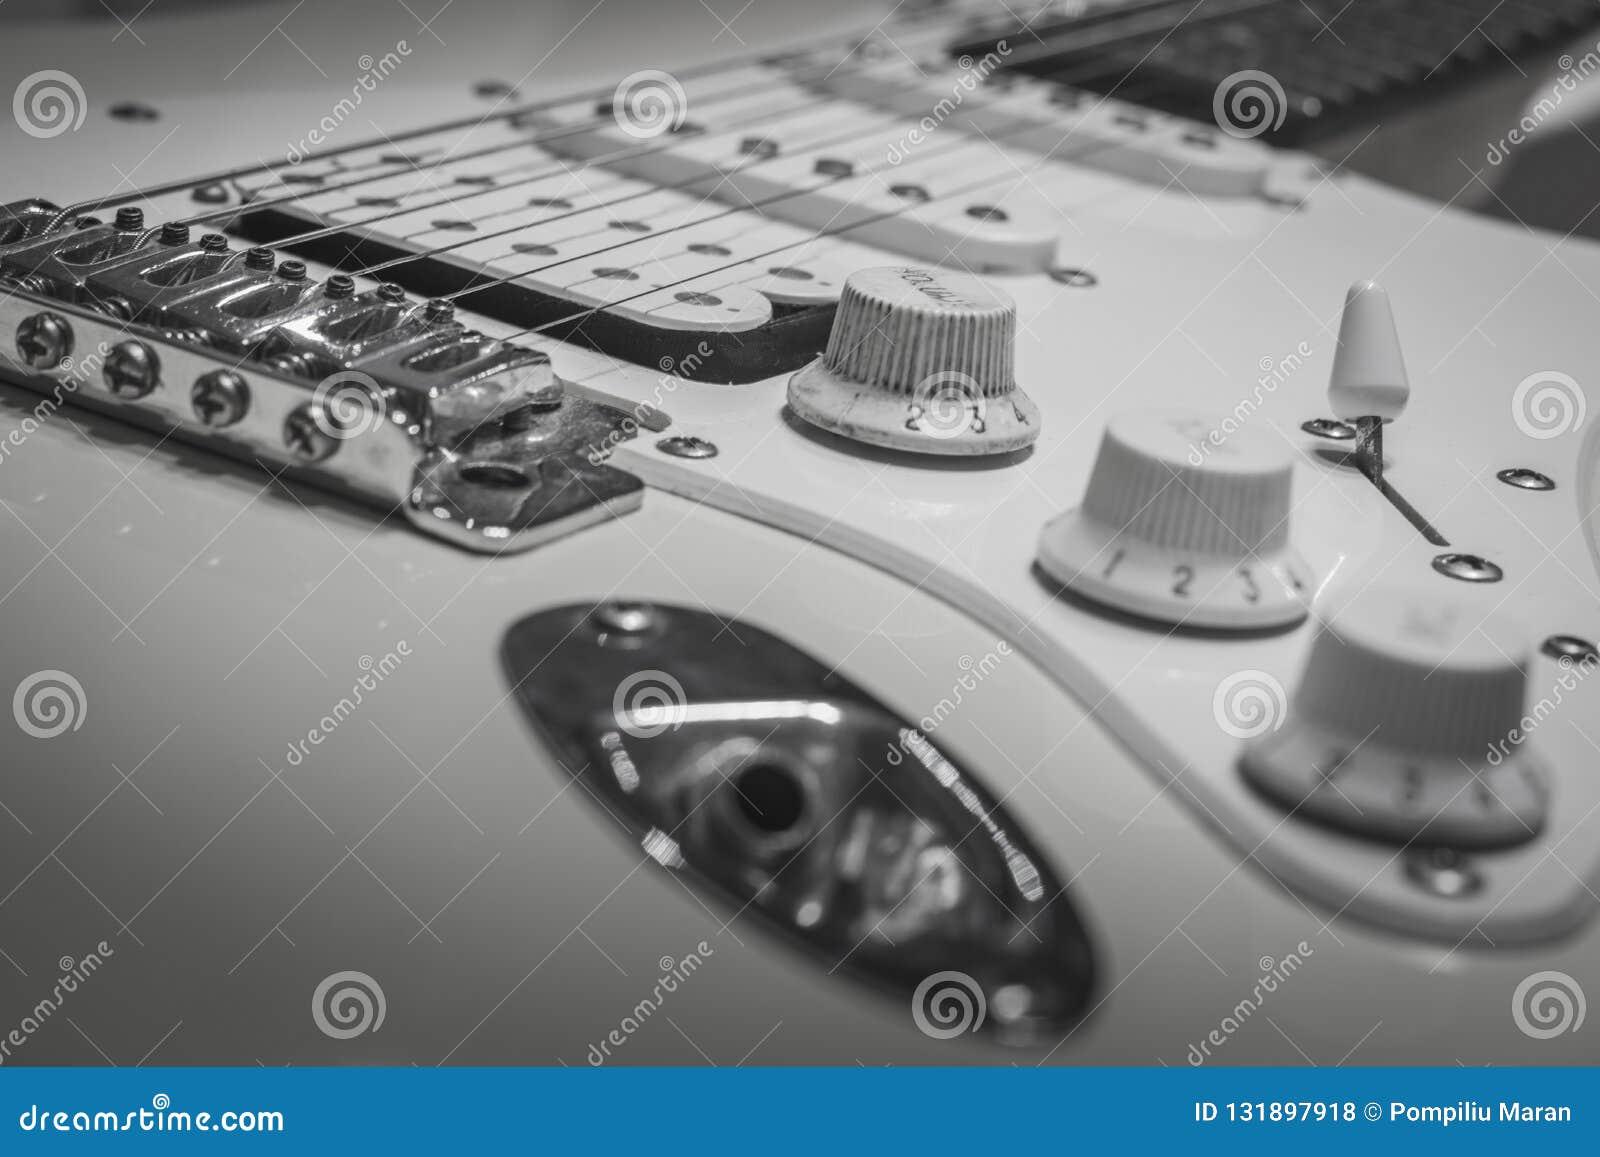 Black White Solo Electric Lead Guitar, Rock Music Stock